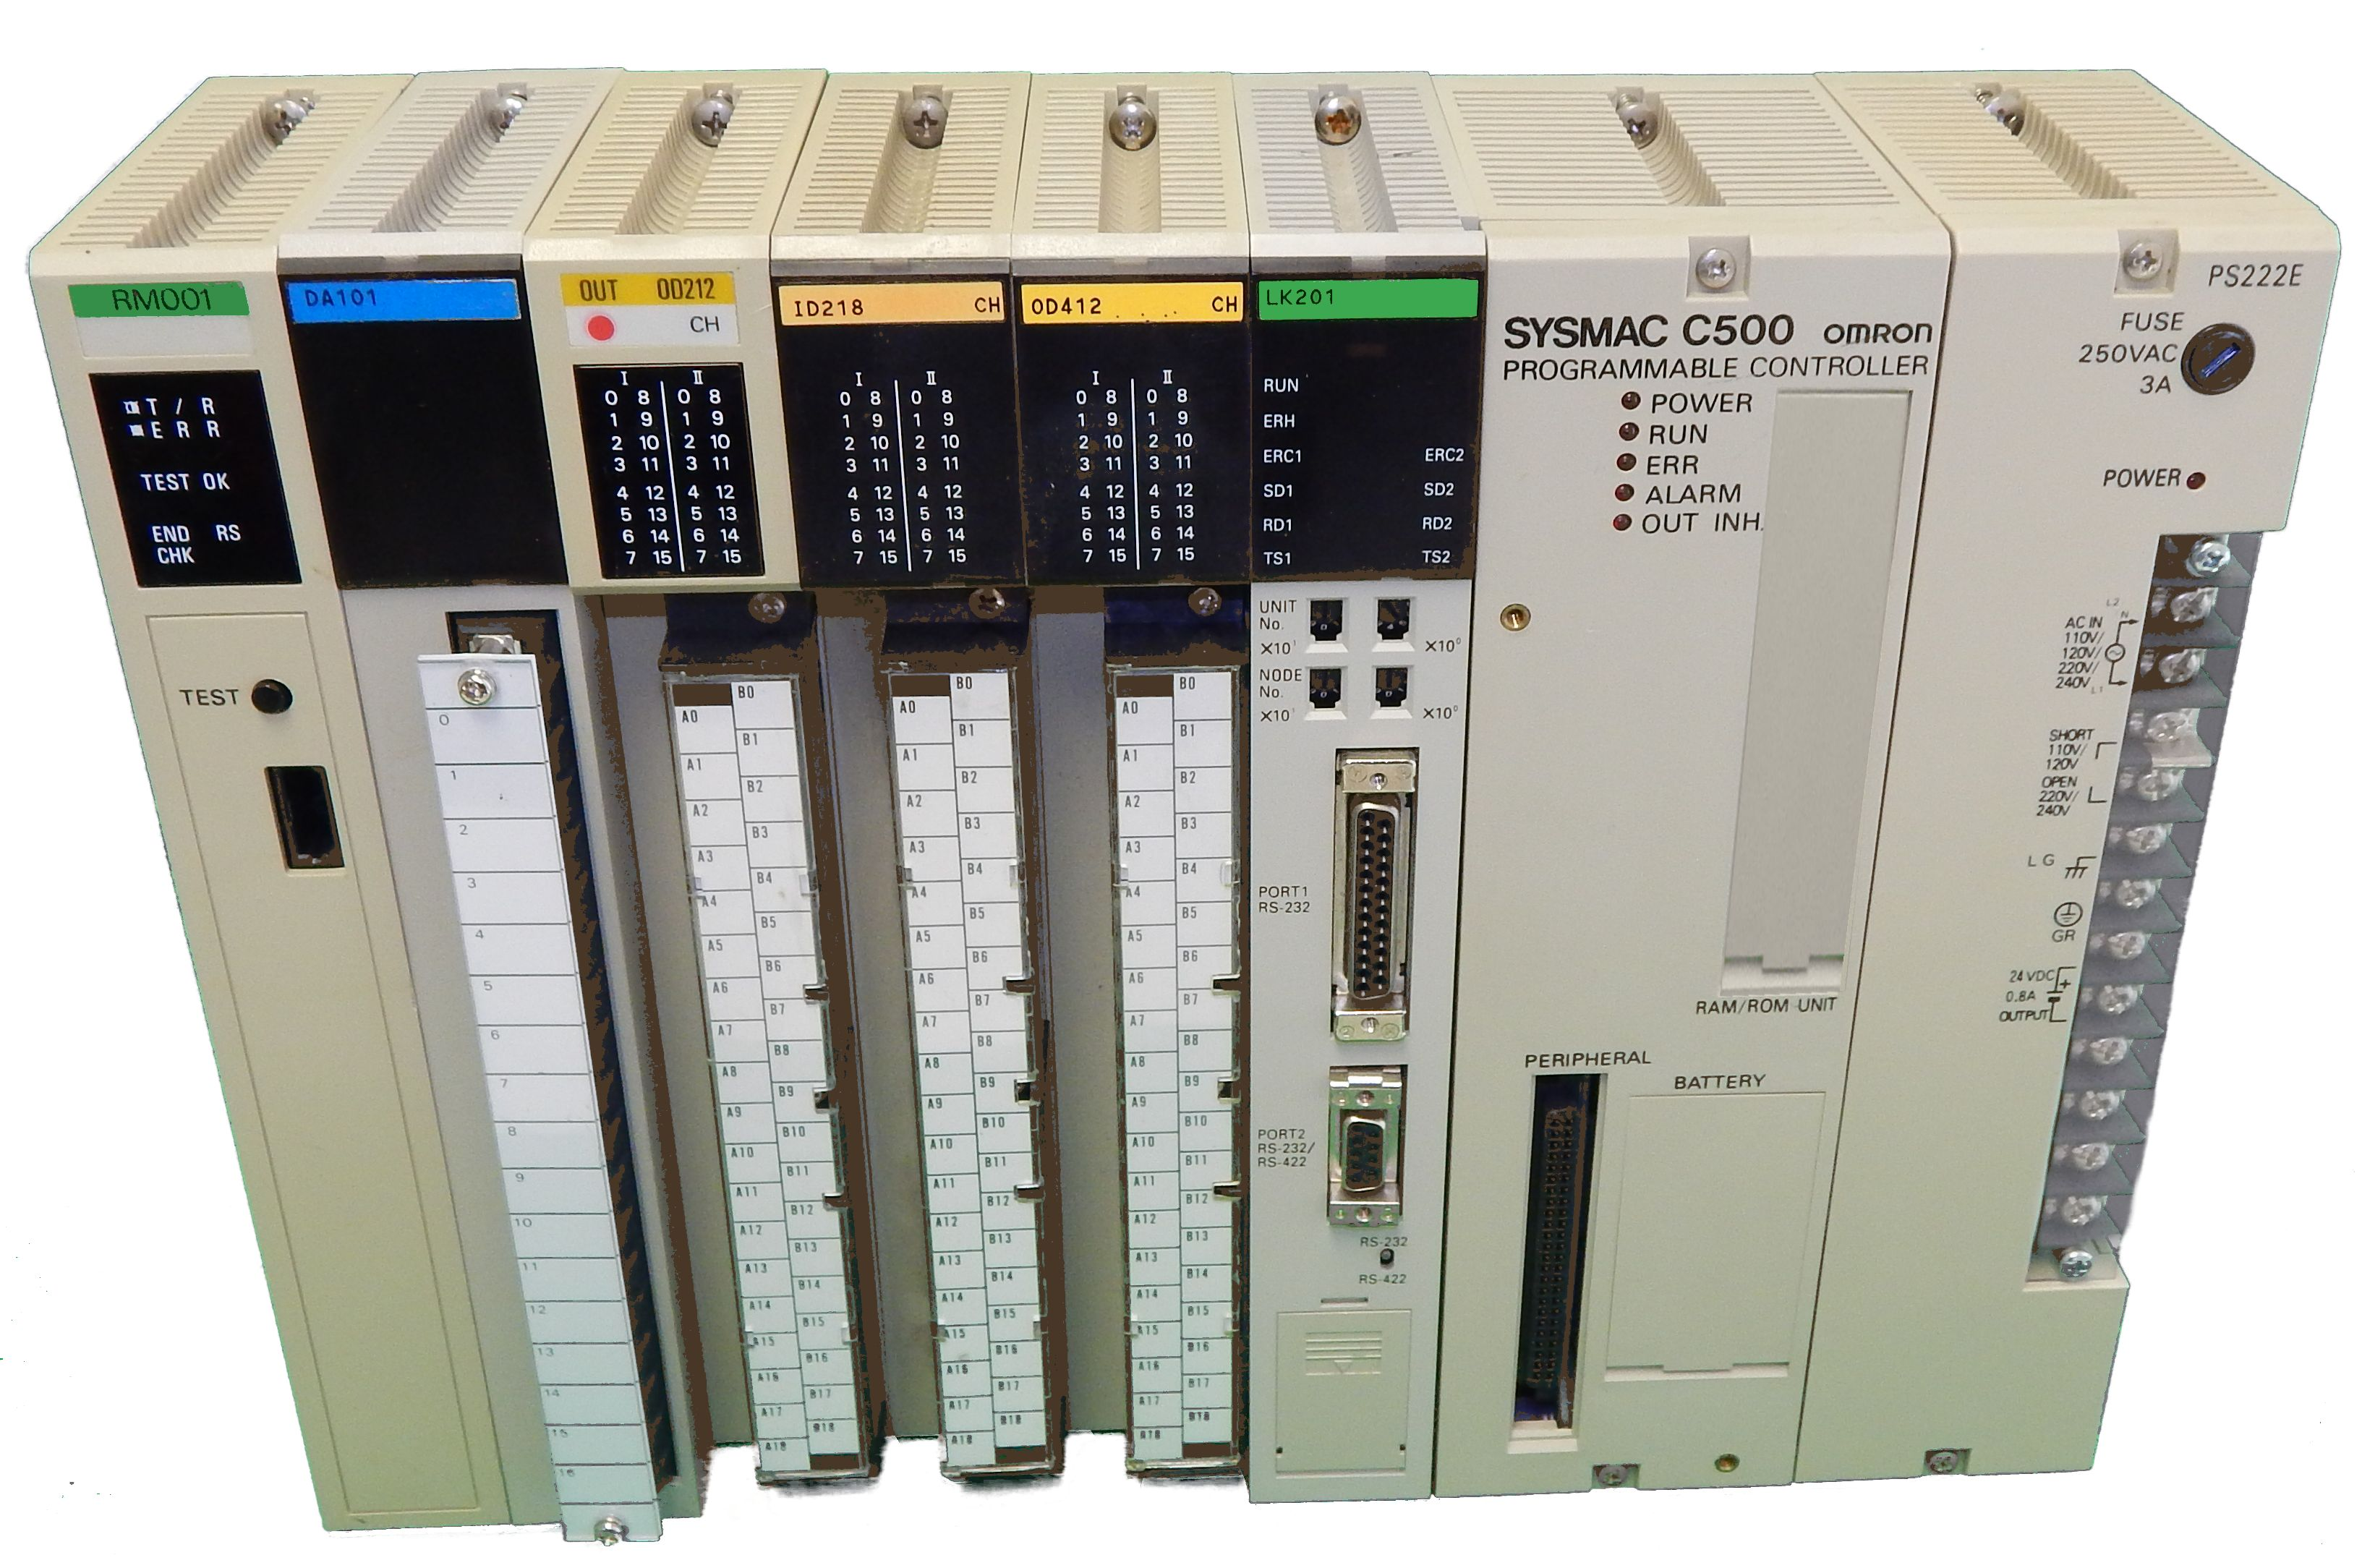 3G2A5-RT001-PEV1